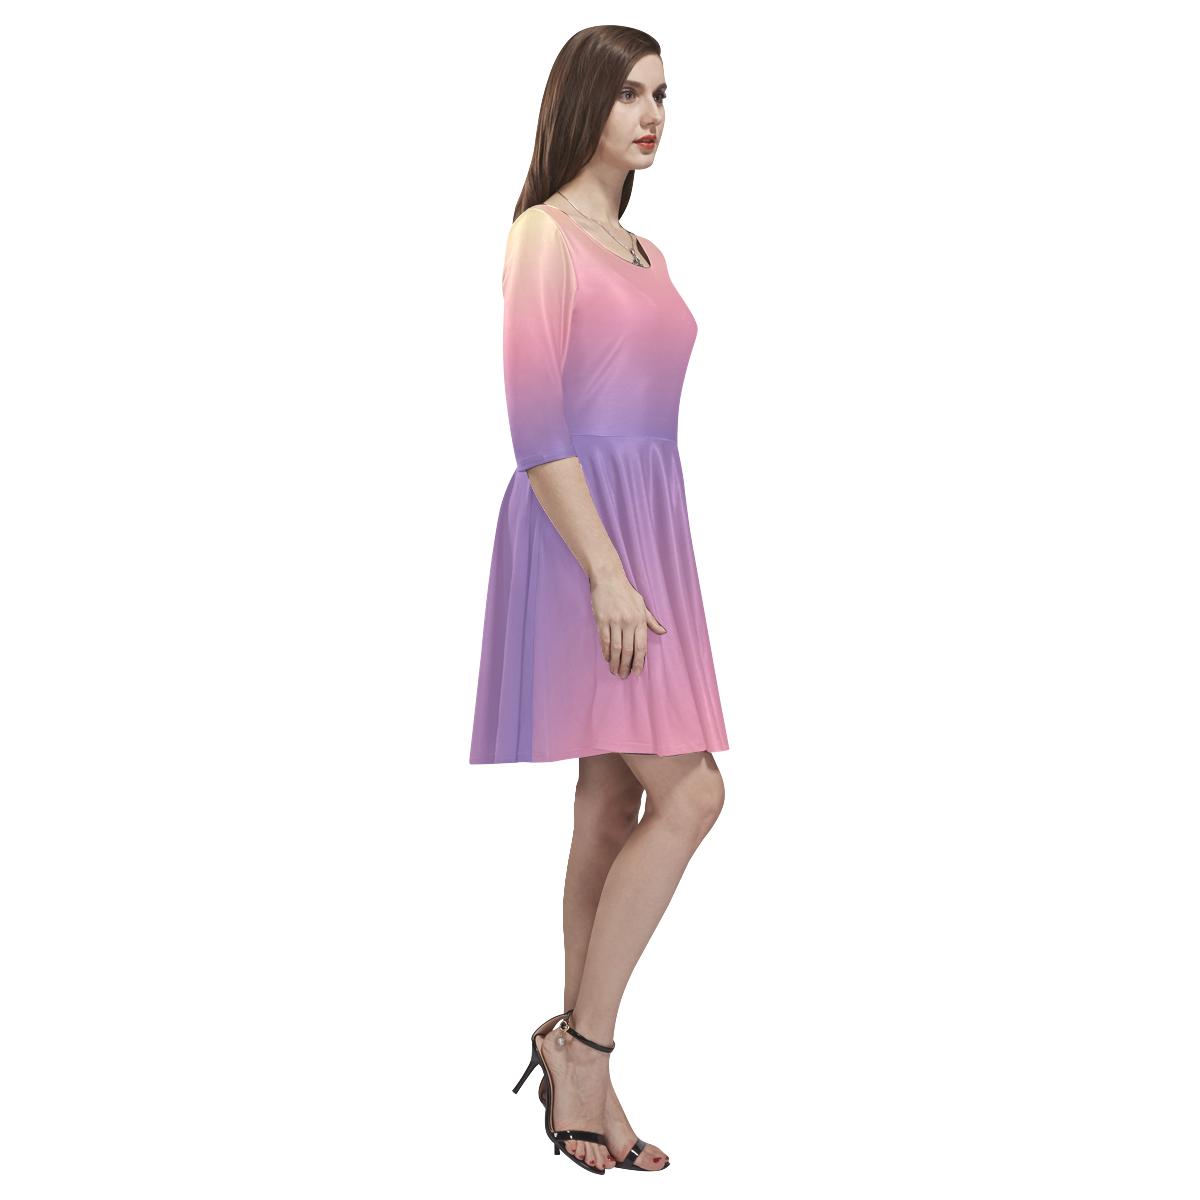 Pastel Ombre Gradient Tethys Half-Sleeve Skater Dress(Model D20)